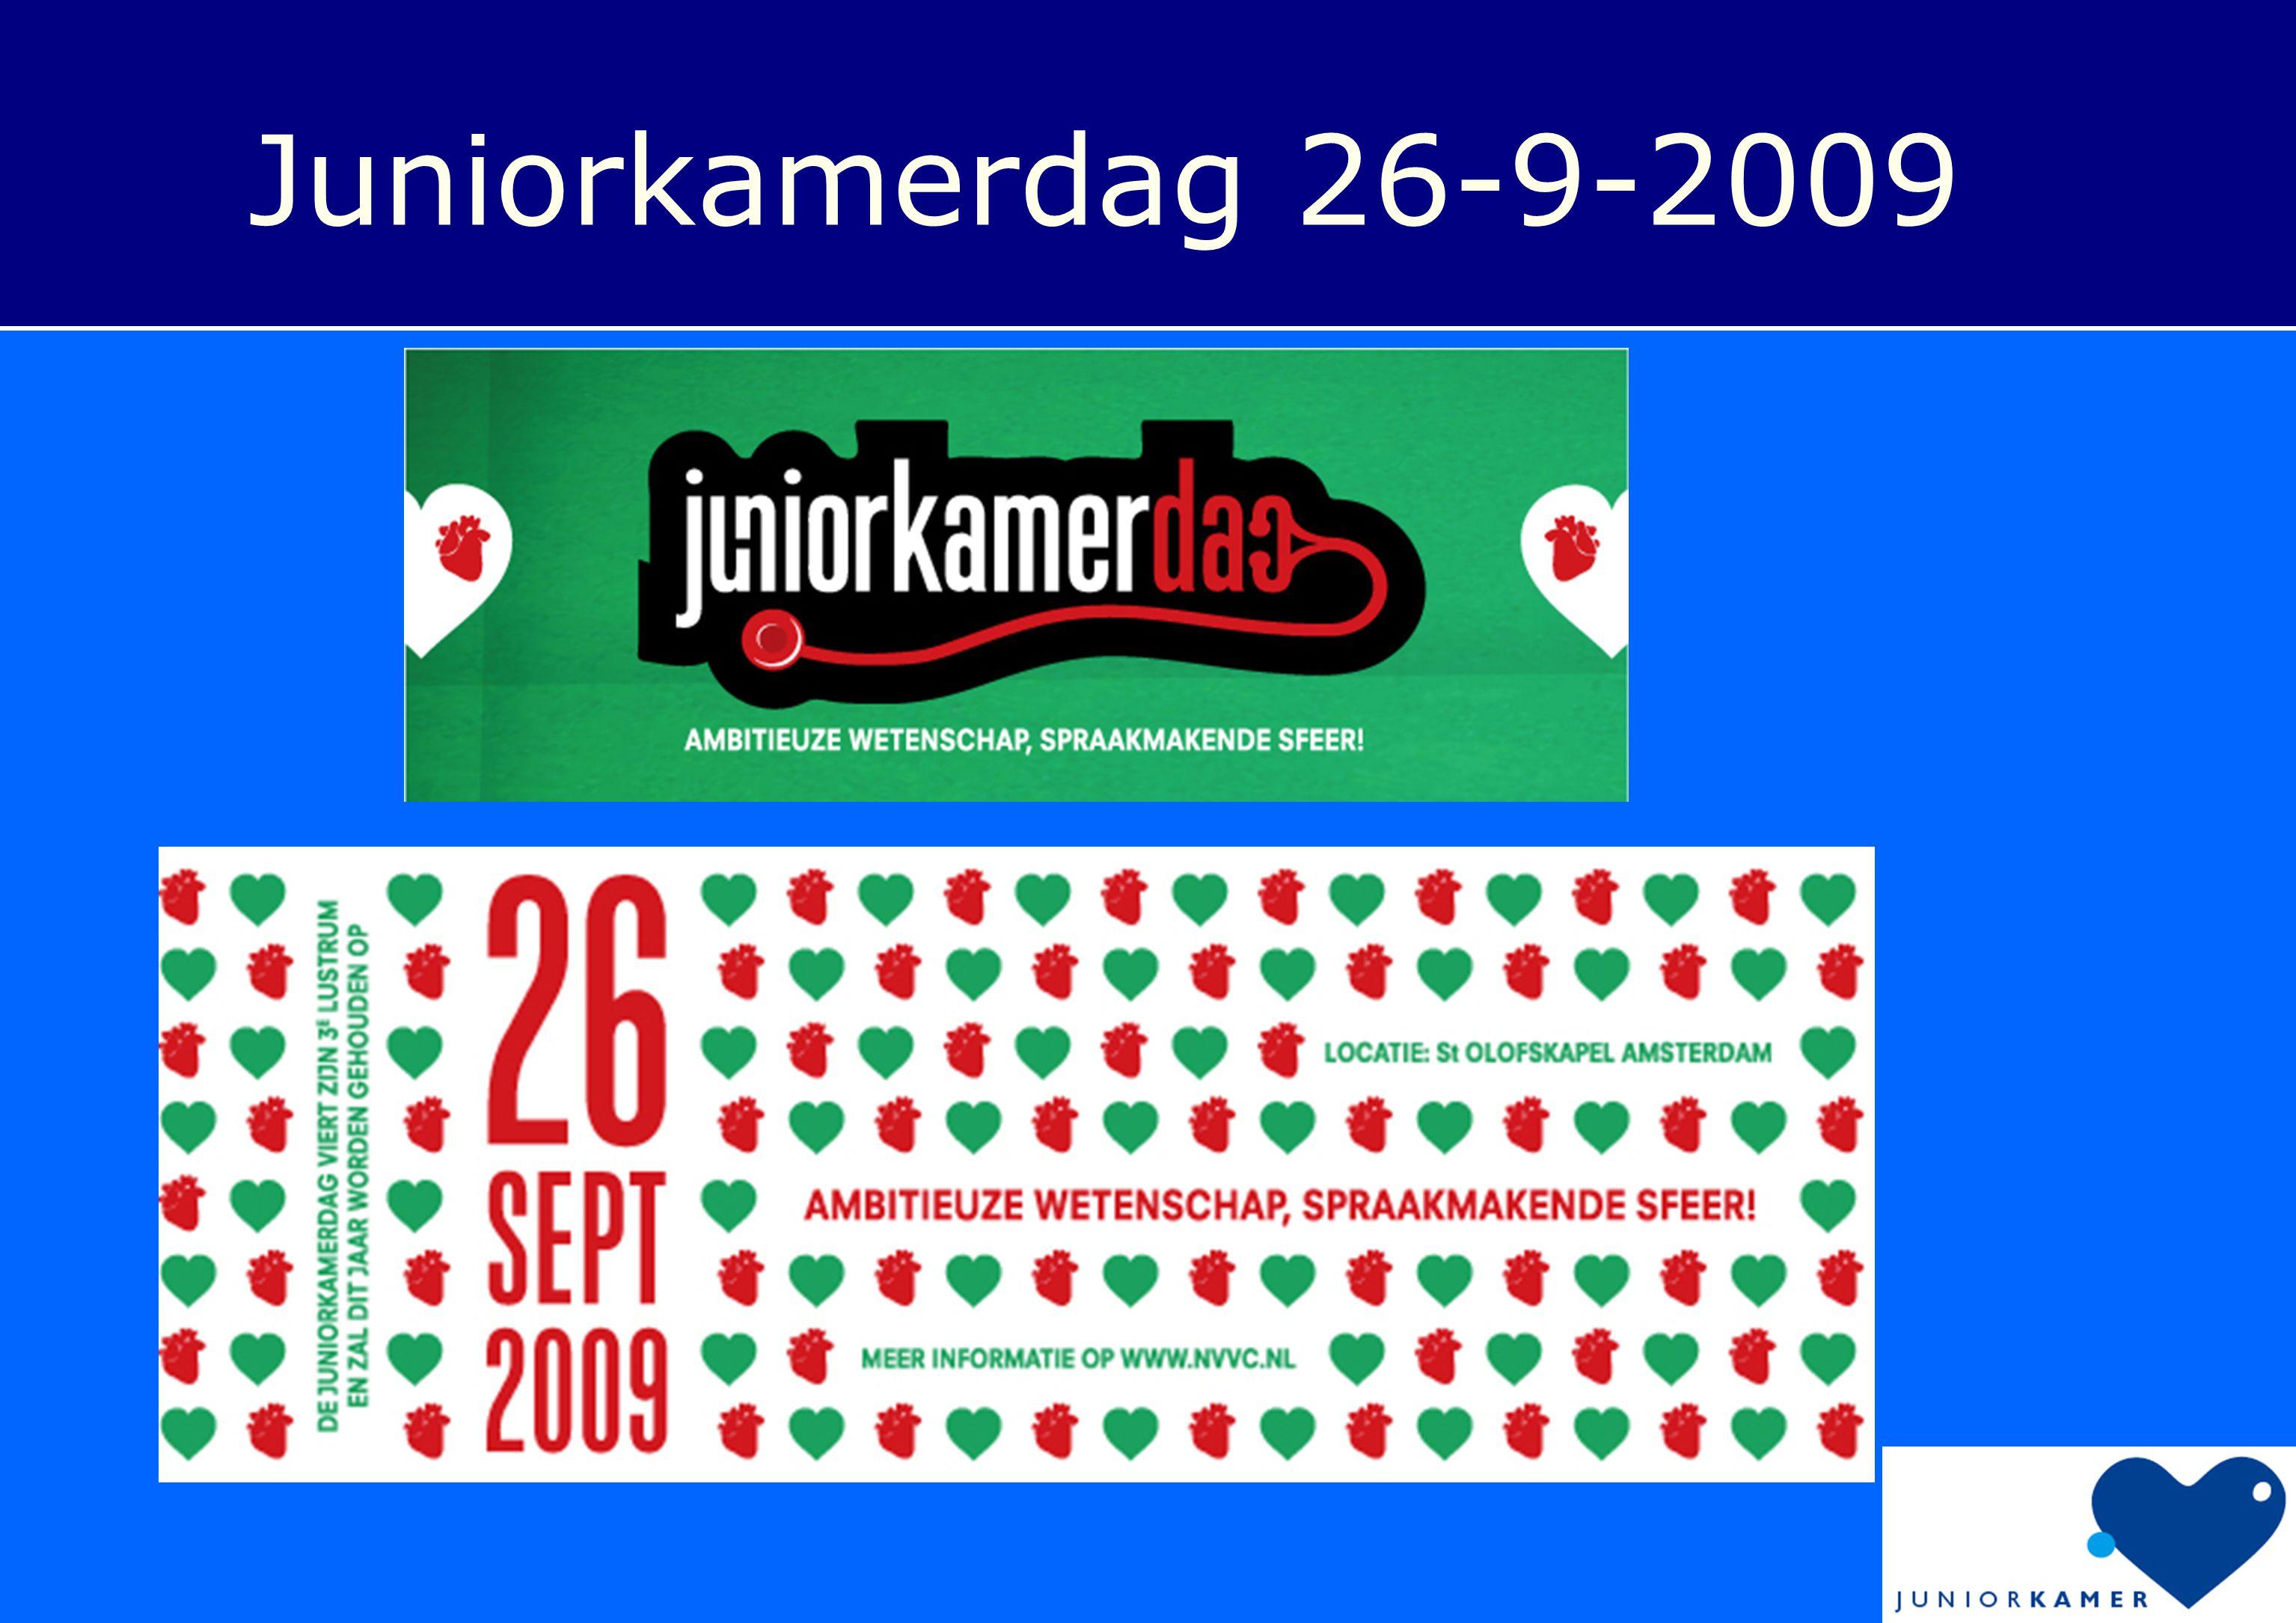 Juniorkamerdag 26-9-2009